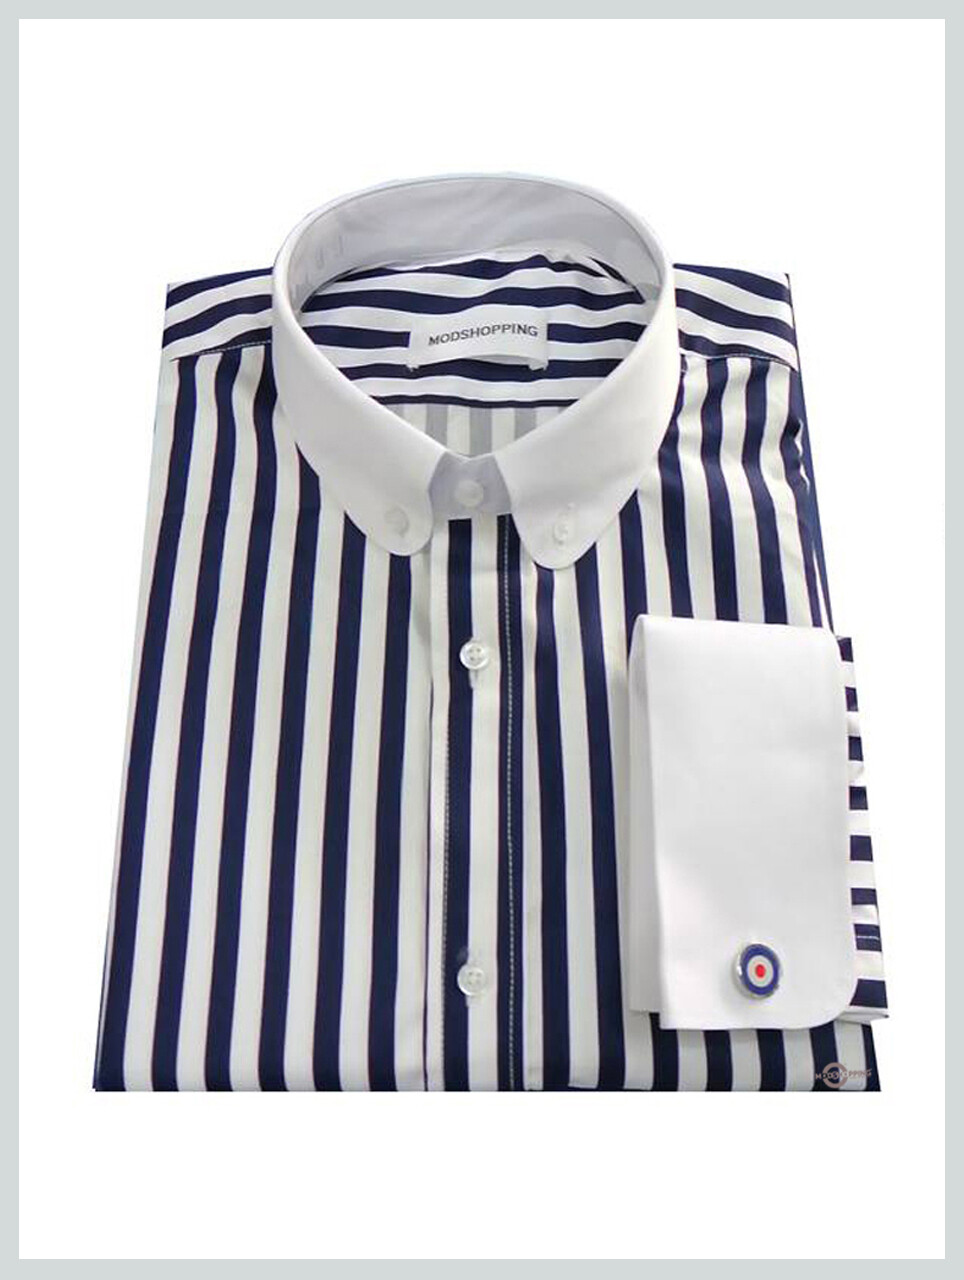 Penny Collar Navy Blue Stripe Shirt For Men, Tailored